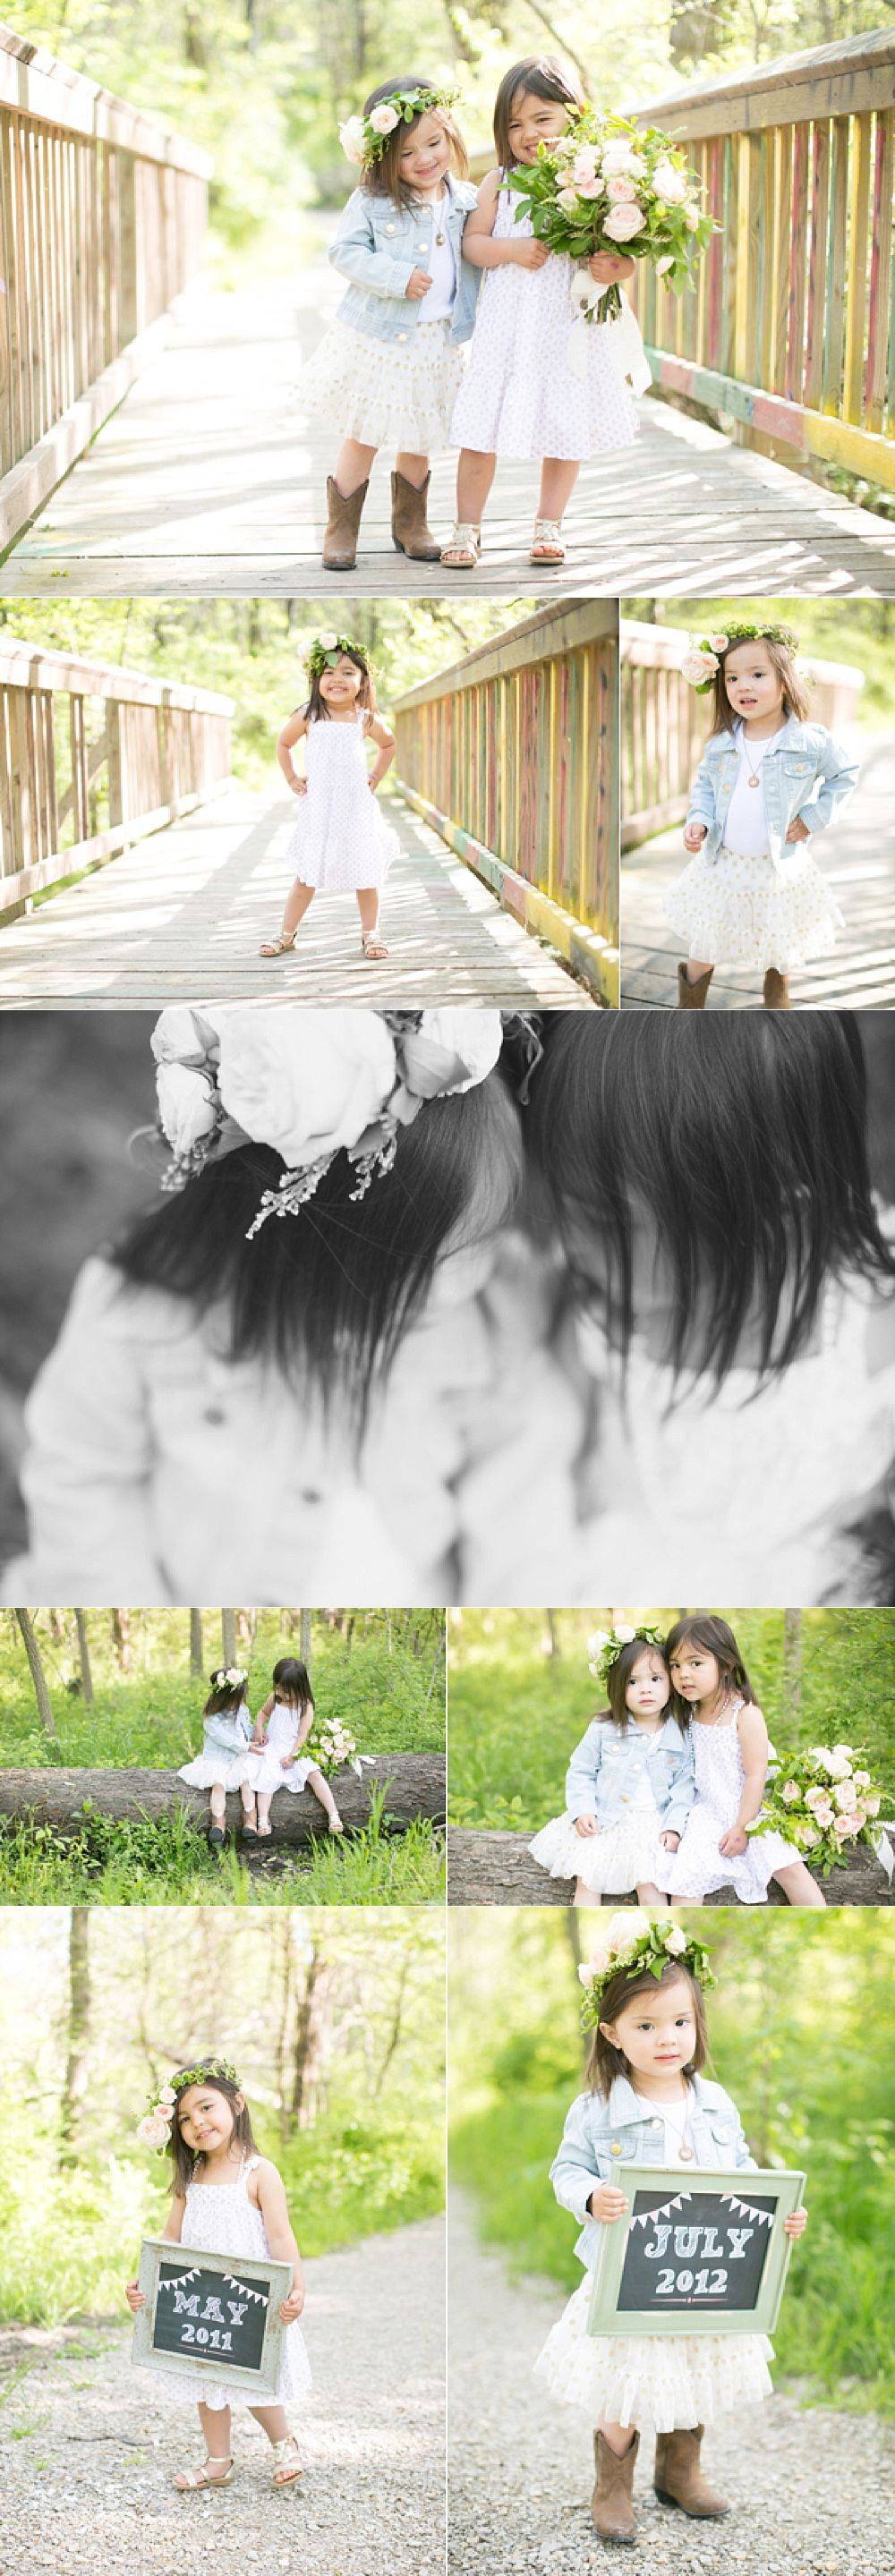 little sister photo ideas